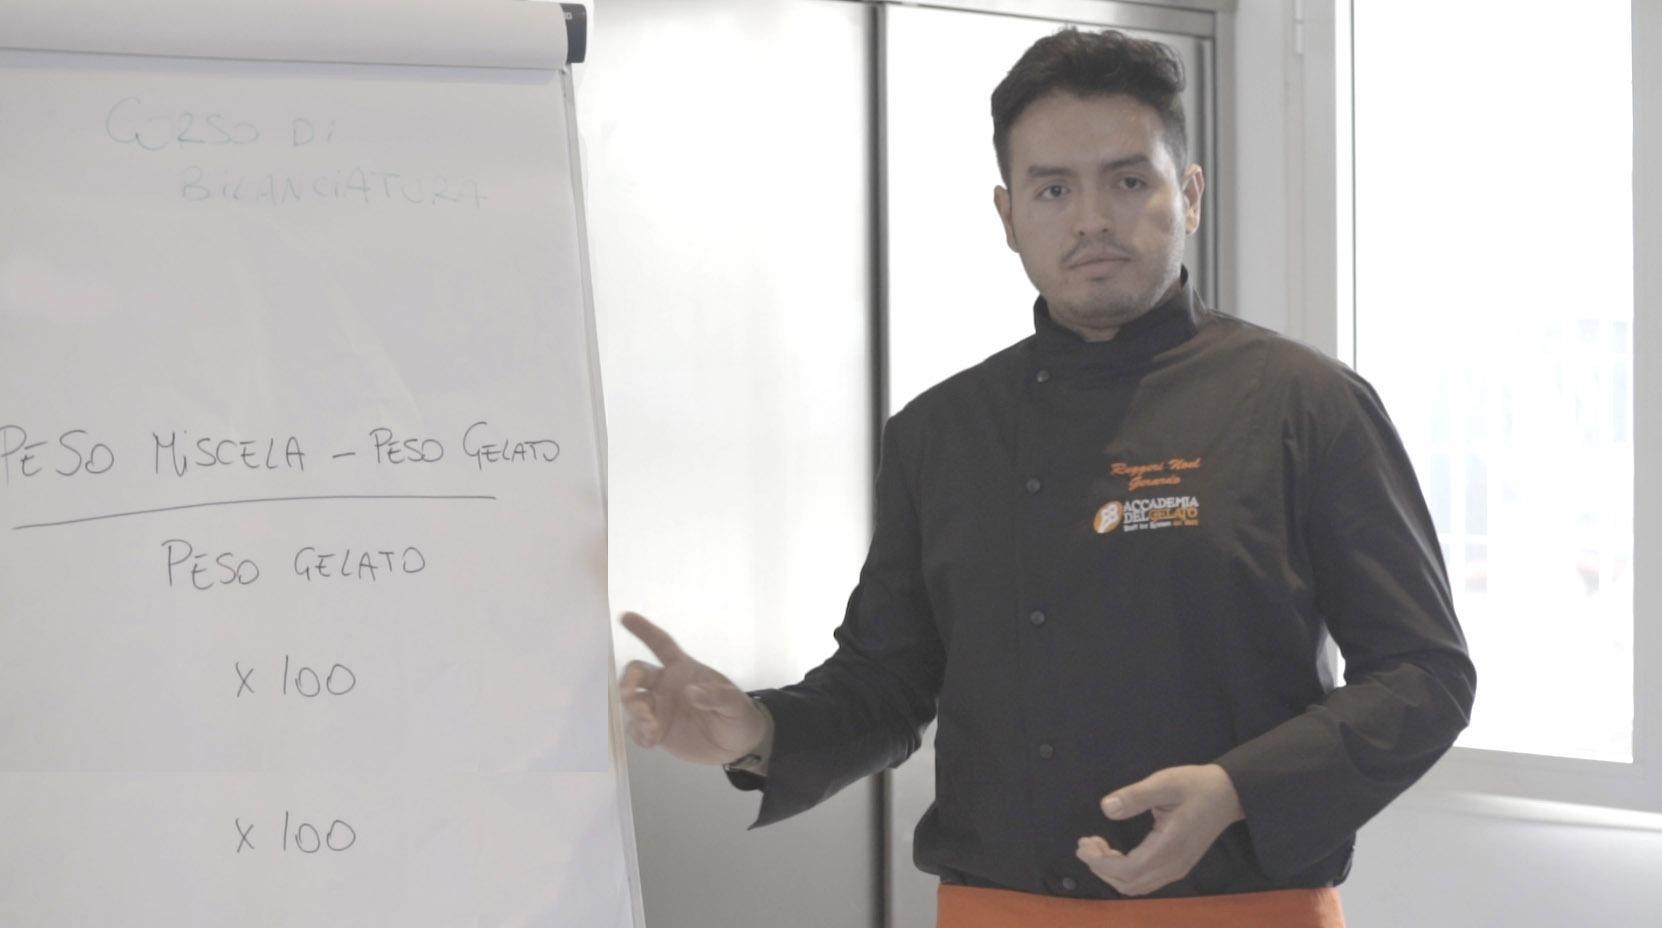 Noel Gerardo Ruggeri